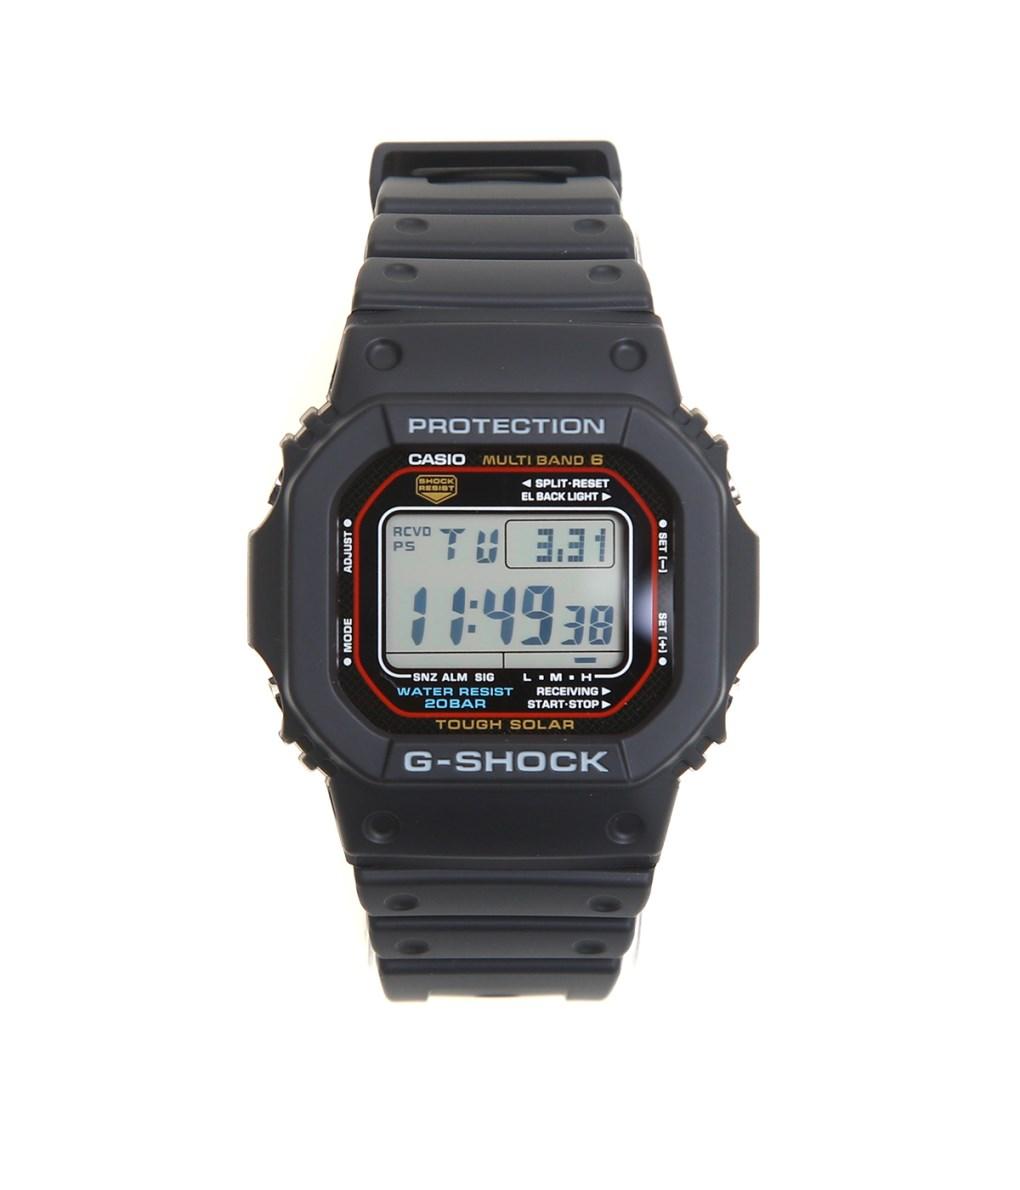 G-SHOCK / ジーショック : GW-M5610 : Gショック CASIO カシオ 腕時計 ウォッチ : GW-M5610-1JF【WAX】